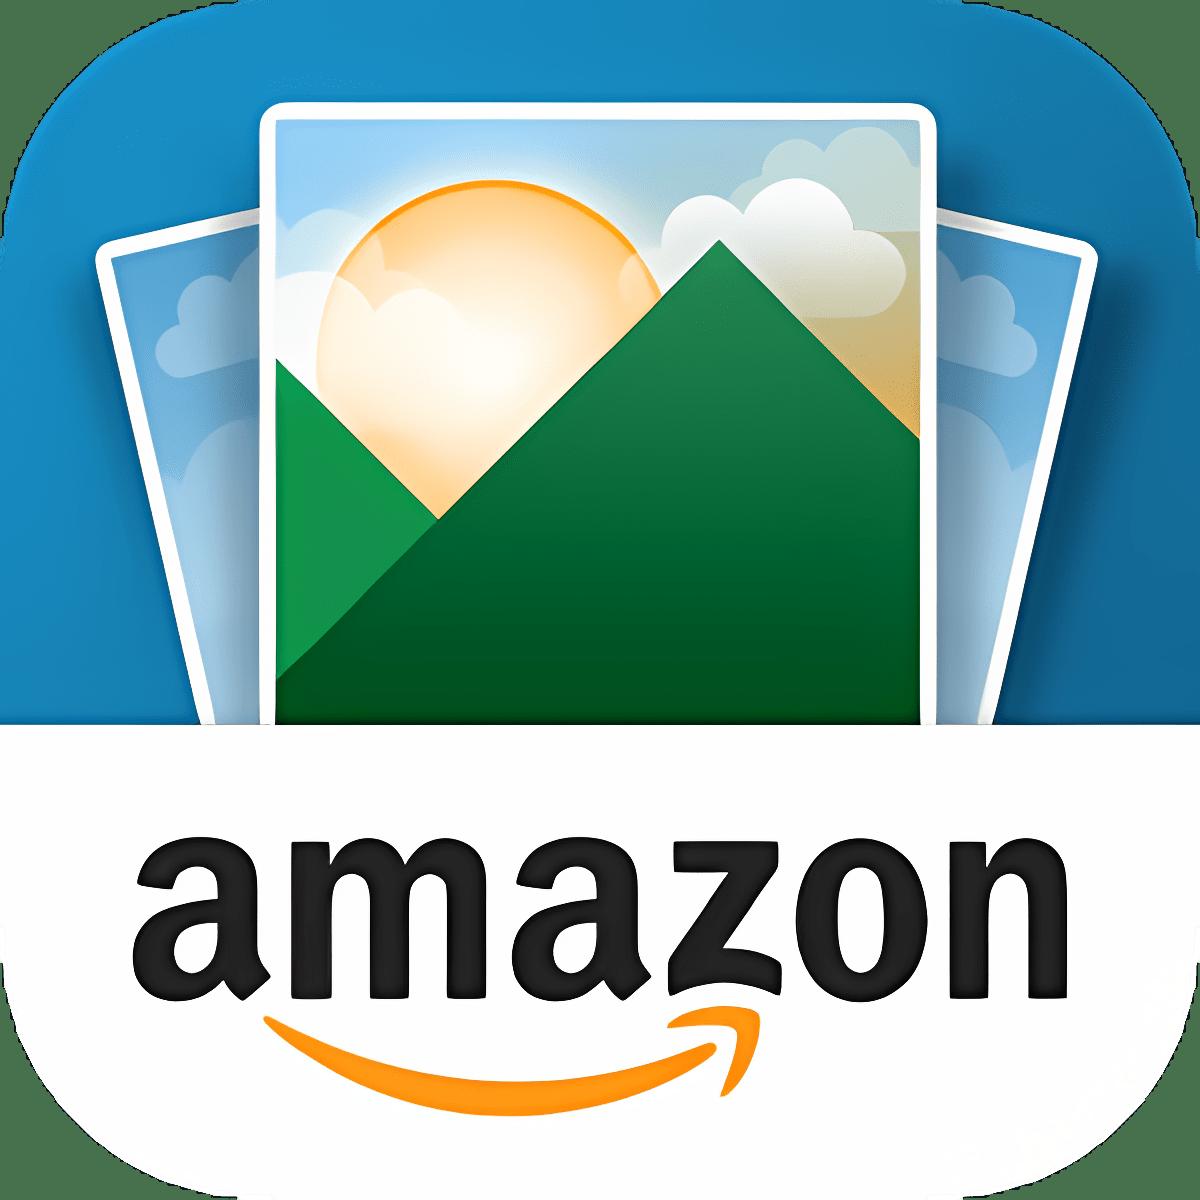 Amazon Cloud Drive Photos 3.3.67.0.1665g